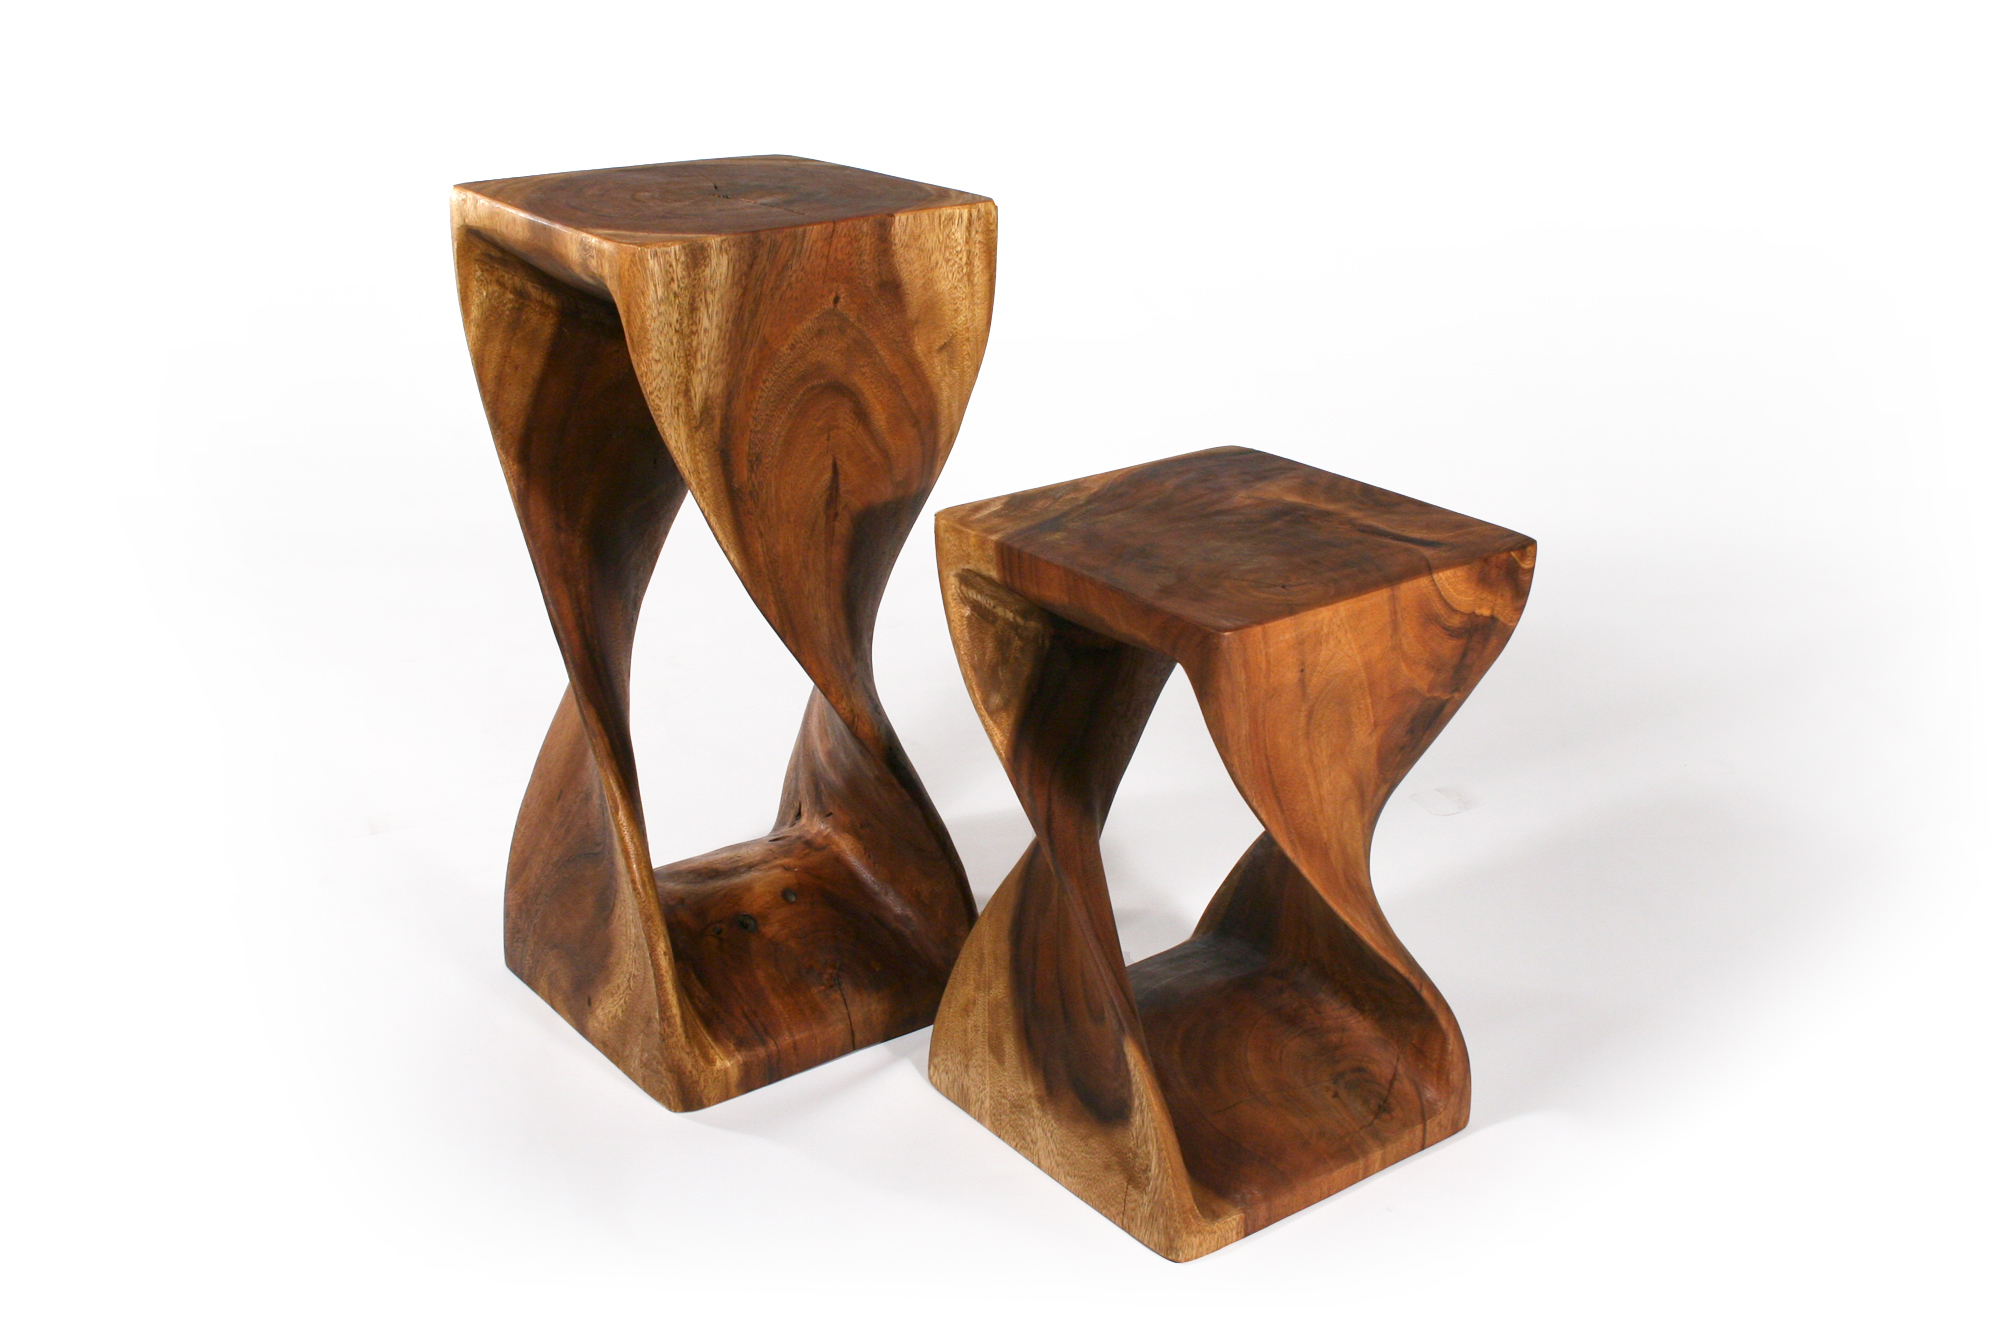 The Twist Strata Furniture